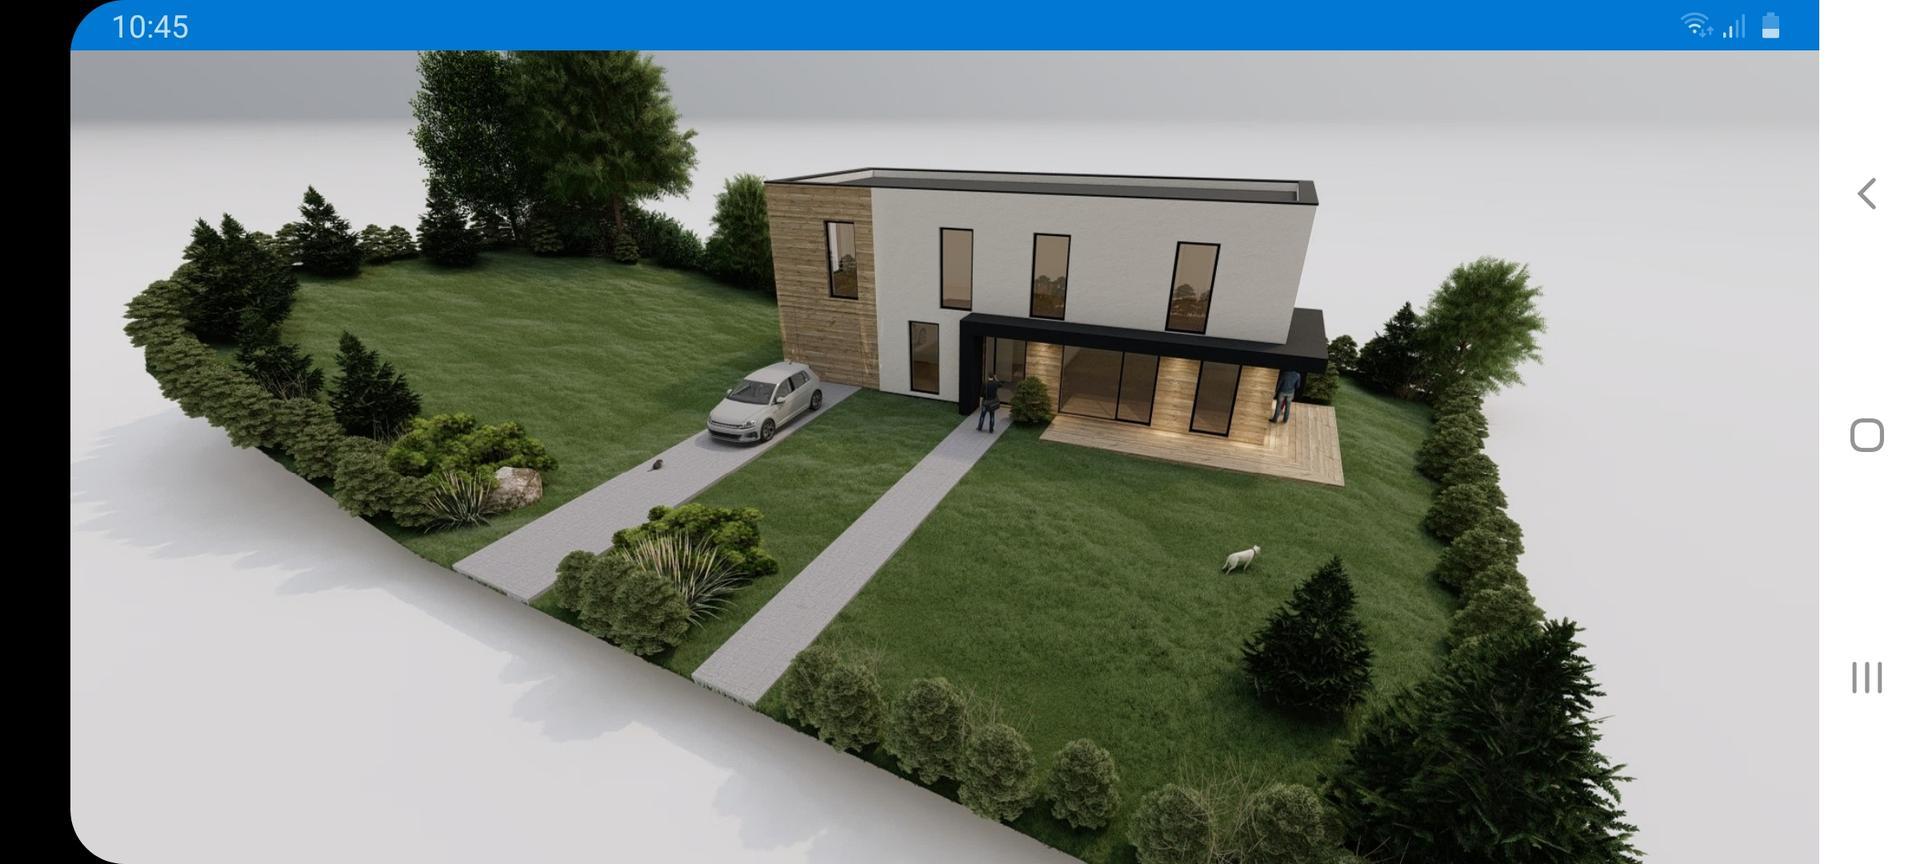 Náš budúci domček 🥰❤ - Obrázok č. 1